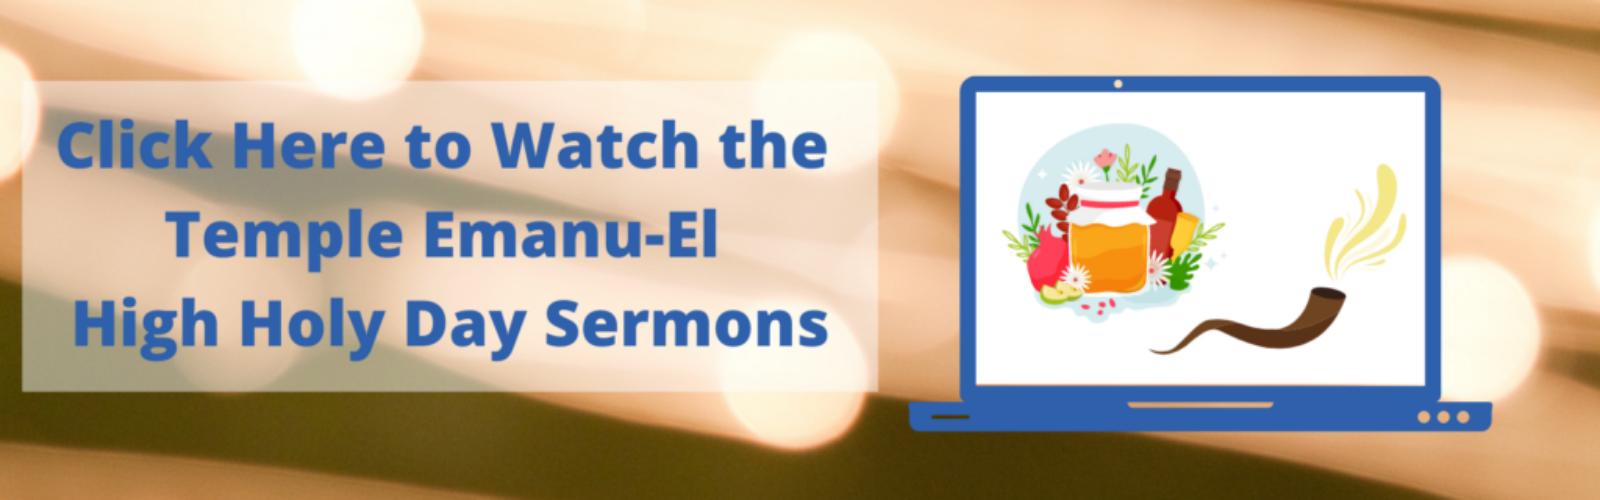 High Holy Day Sermons